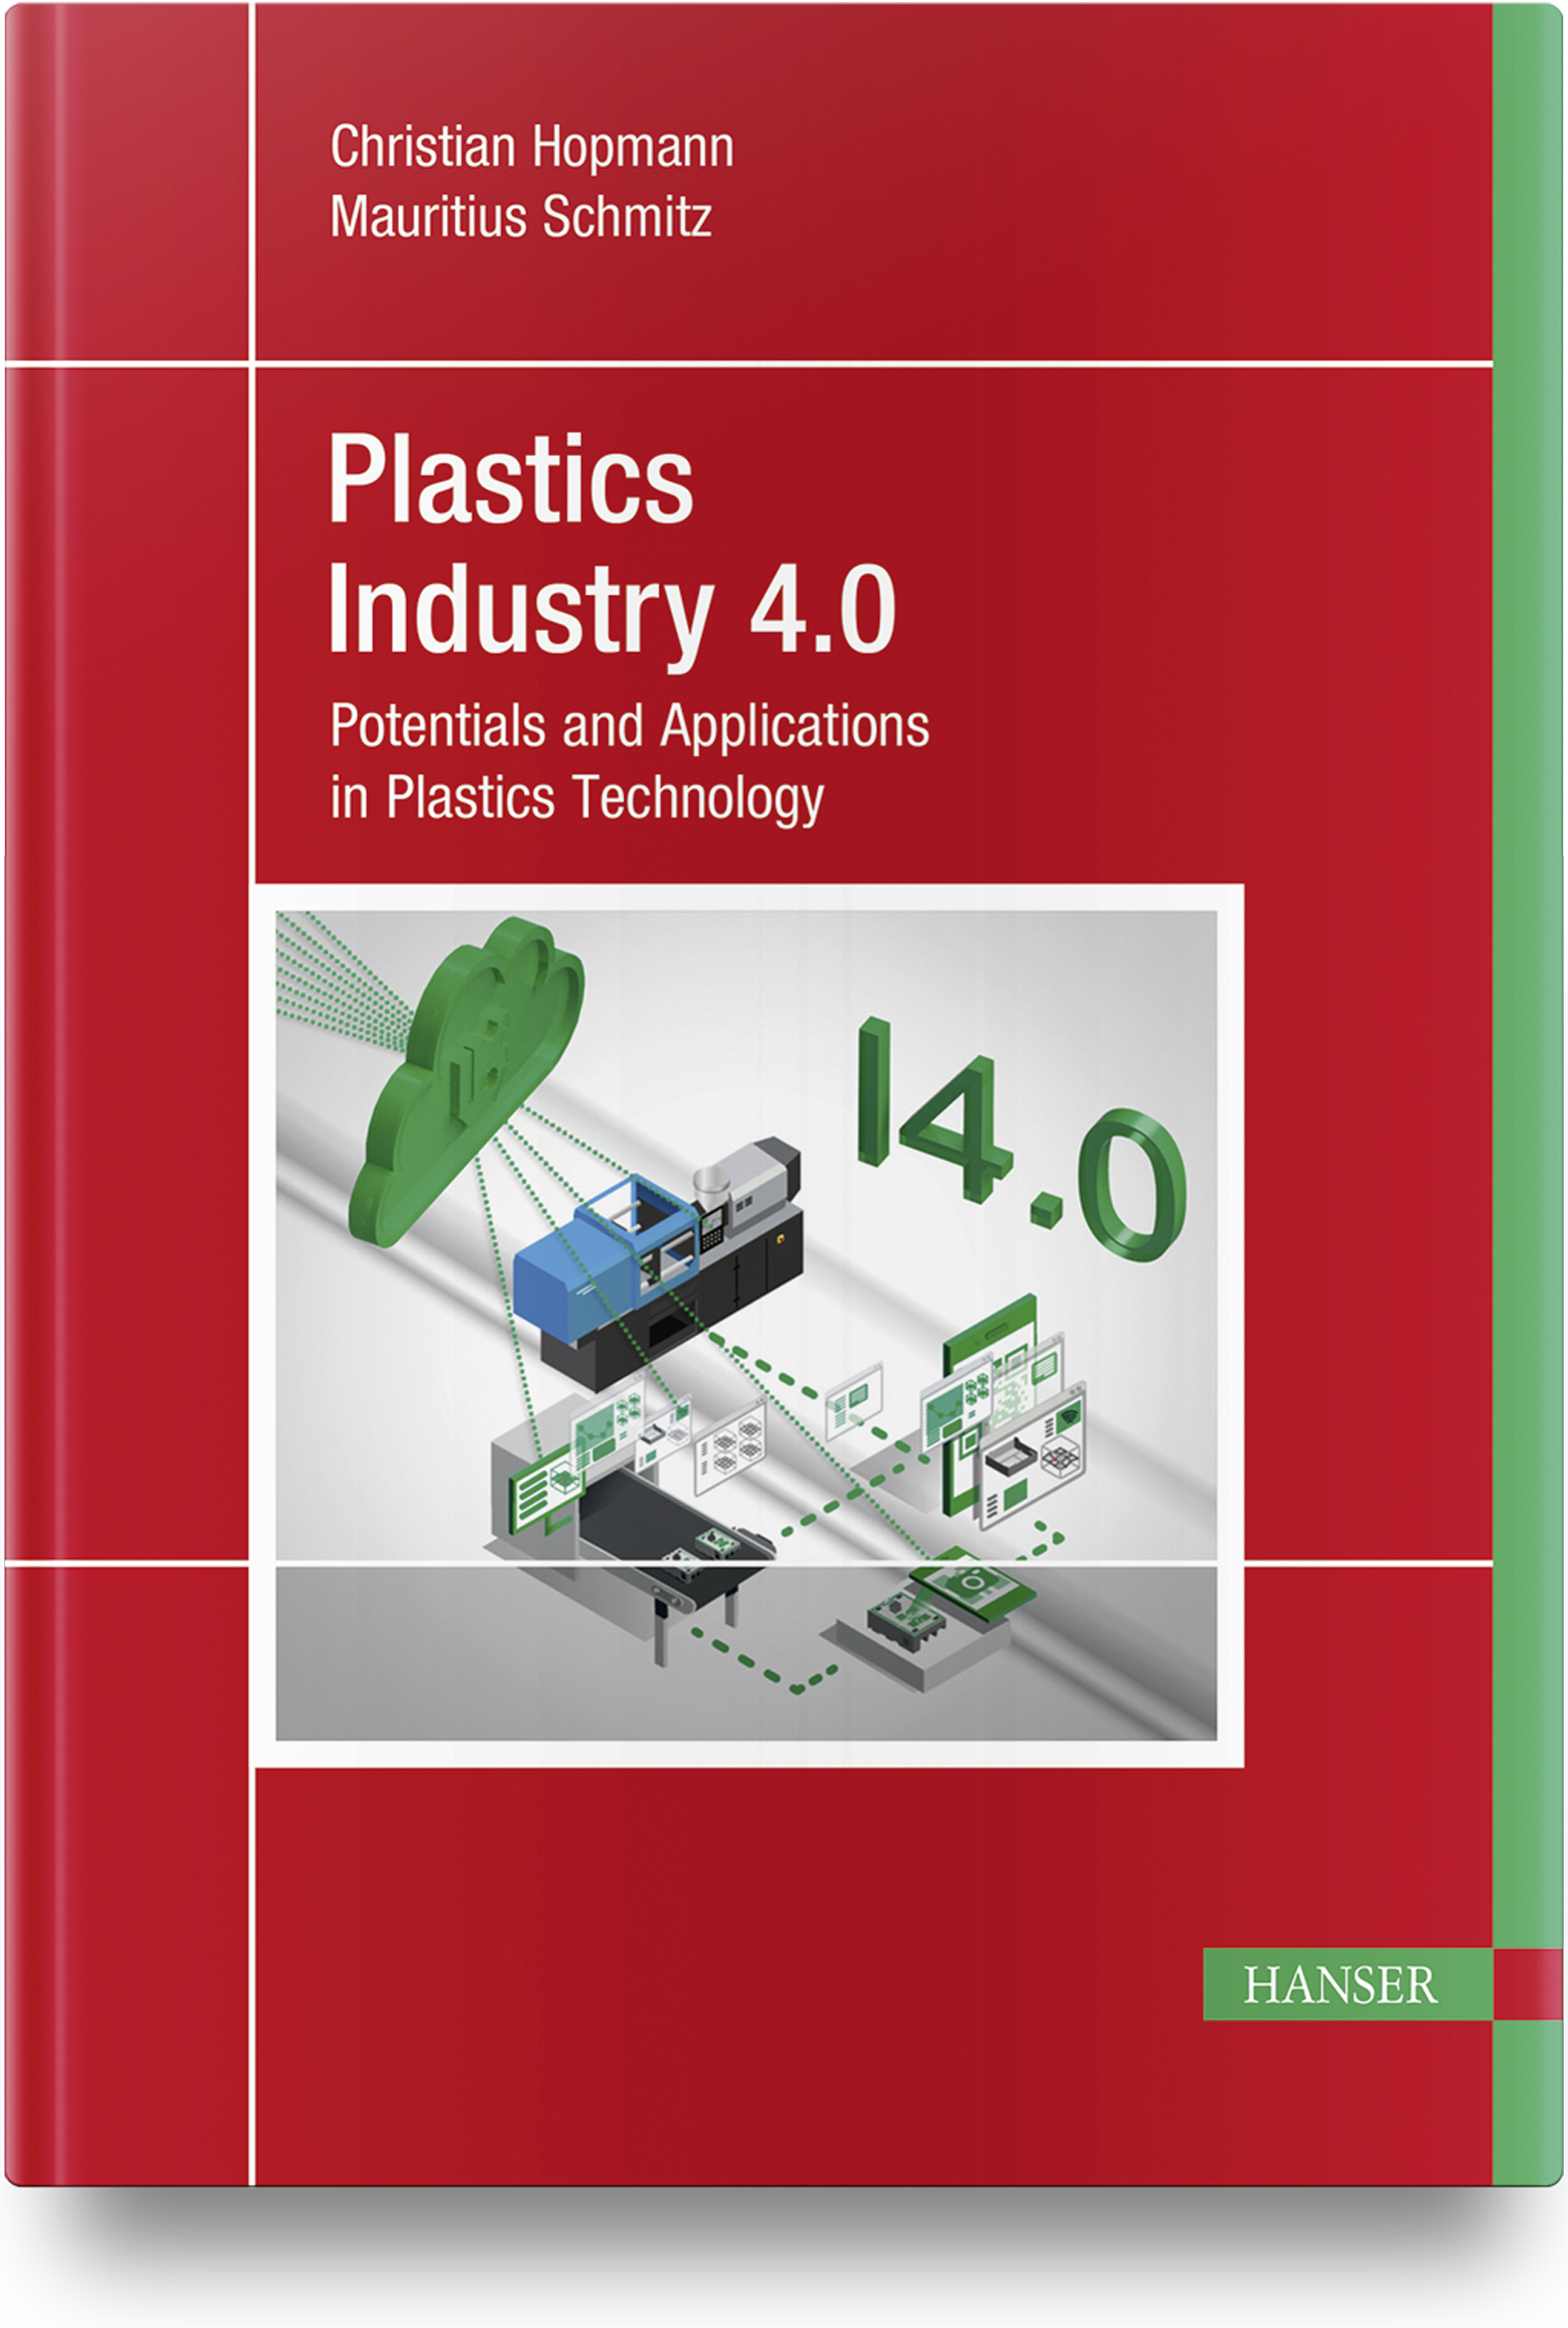 Hopmann, Plastics Industry 4.0, 978-1-56990-796-2